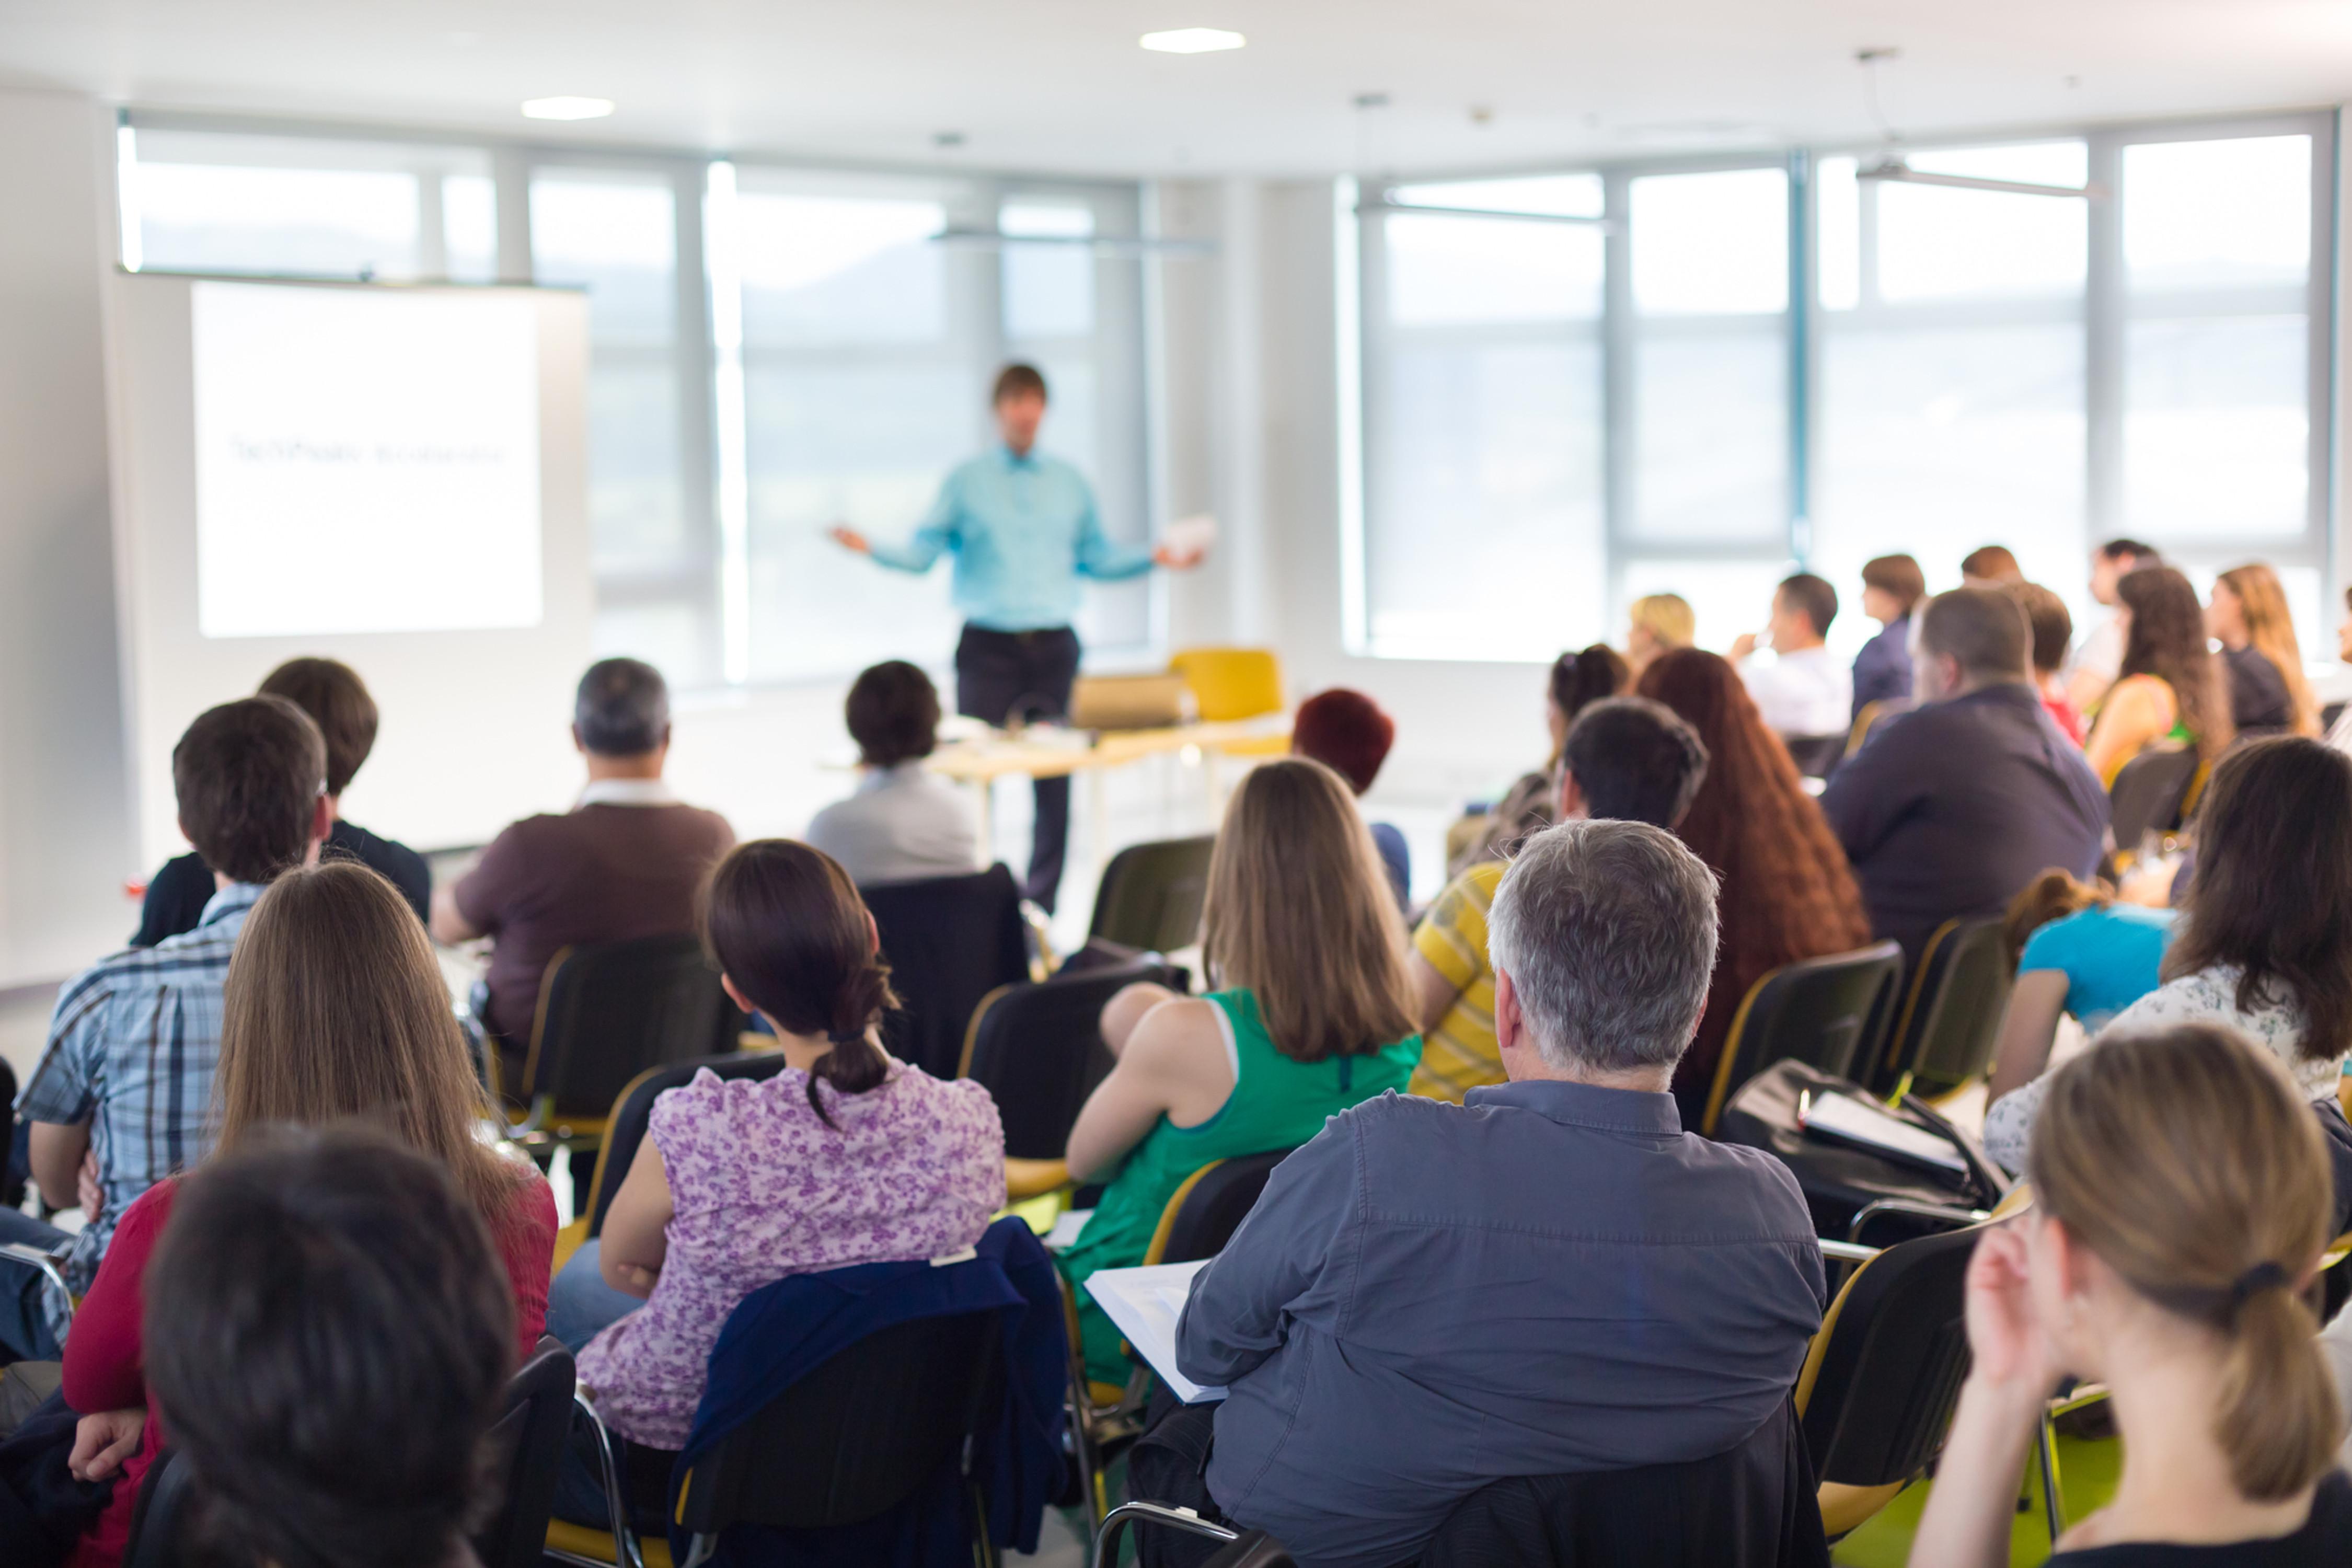 UIA Education and Training